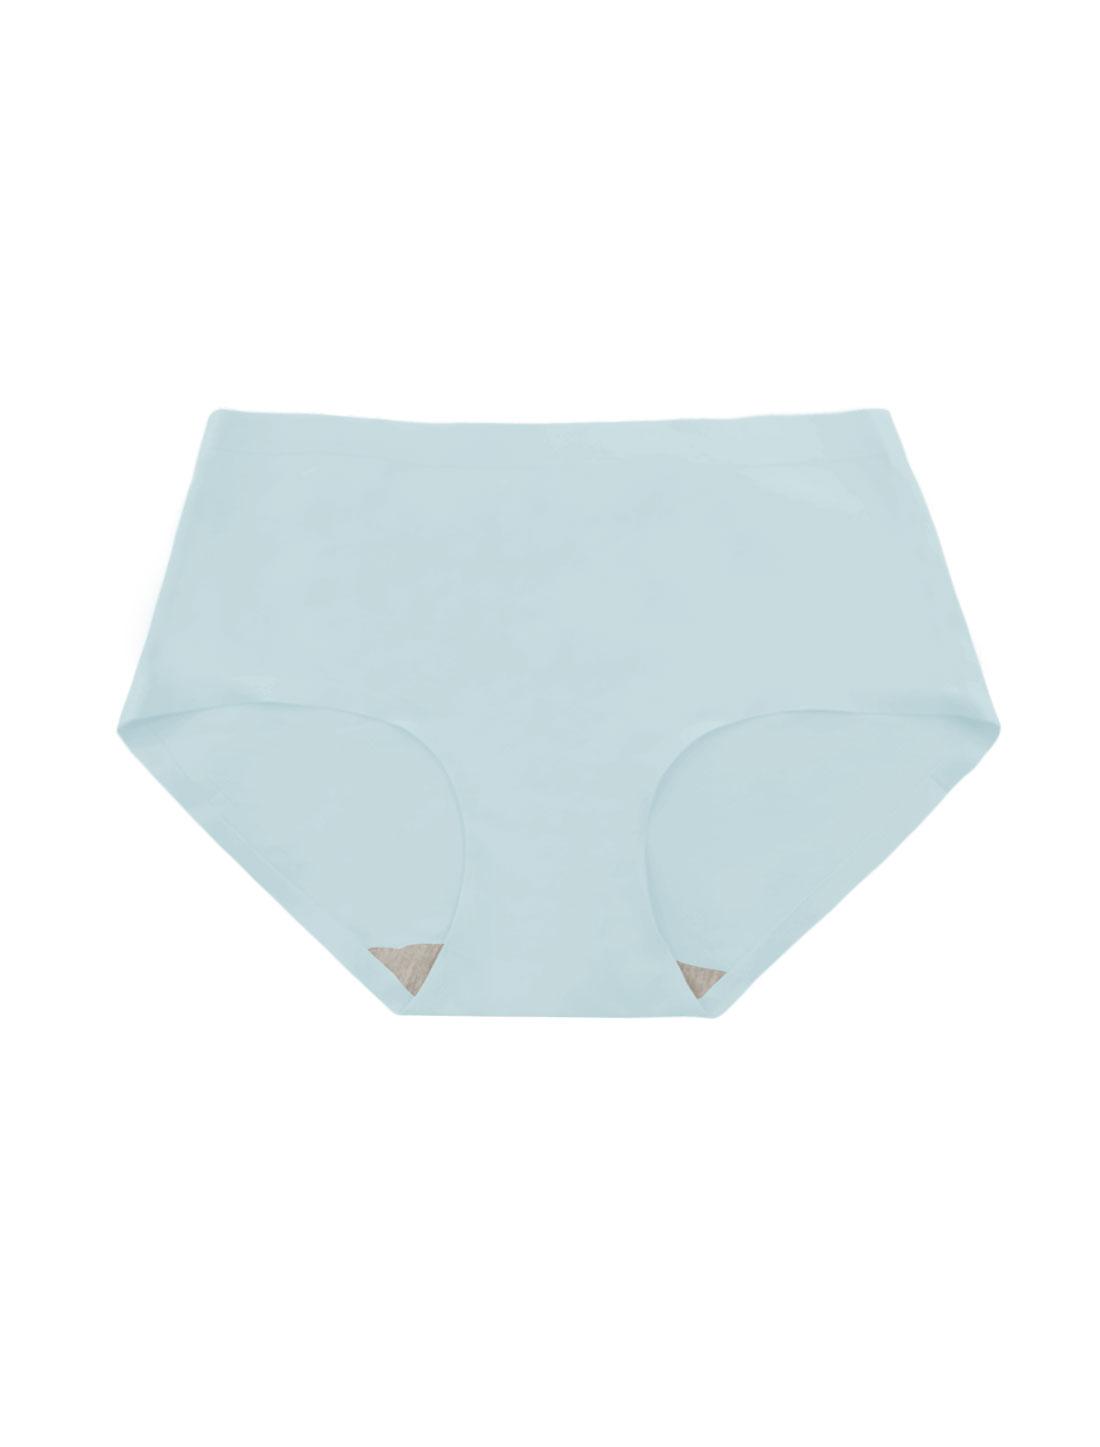 Women Mid Rise Elastic Waist Seamless Stretchy Panty Light Blue XS